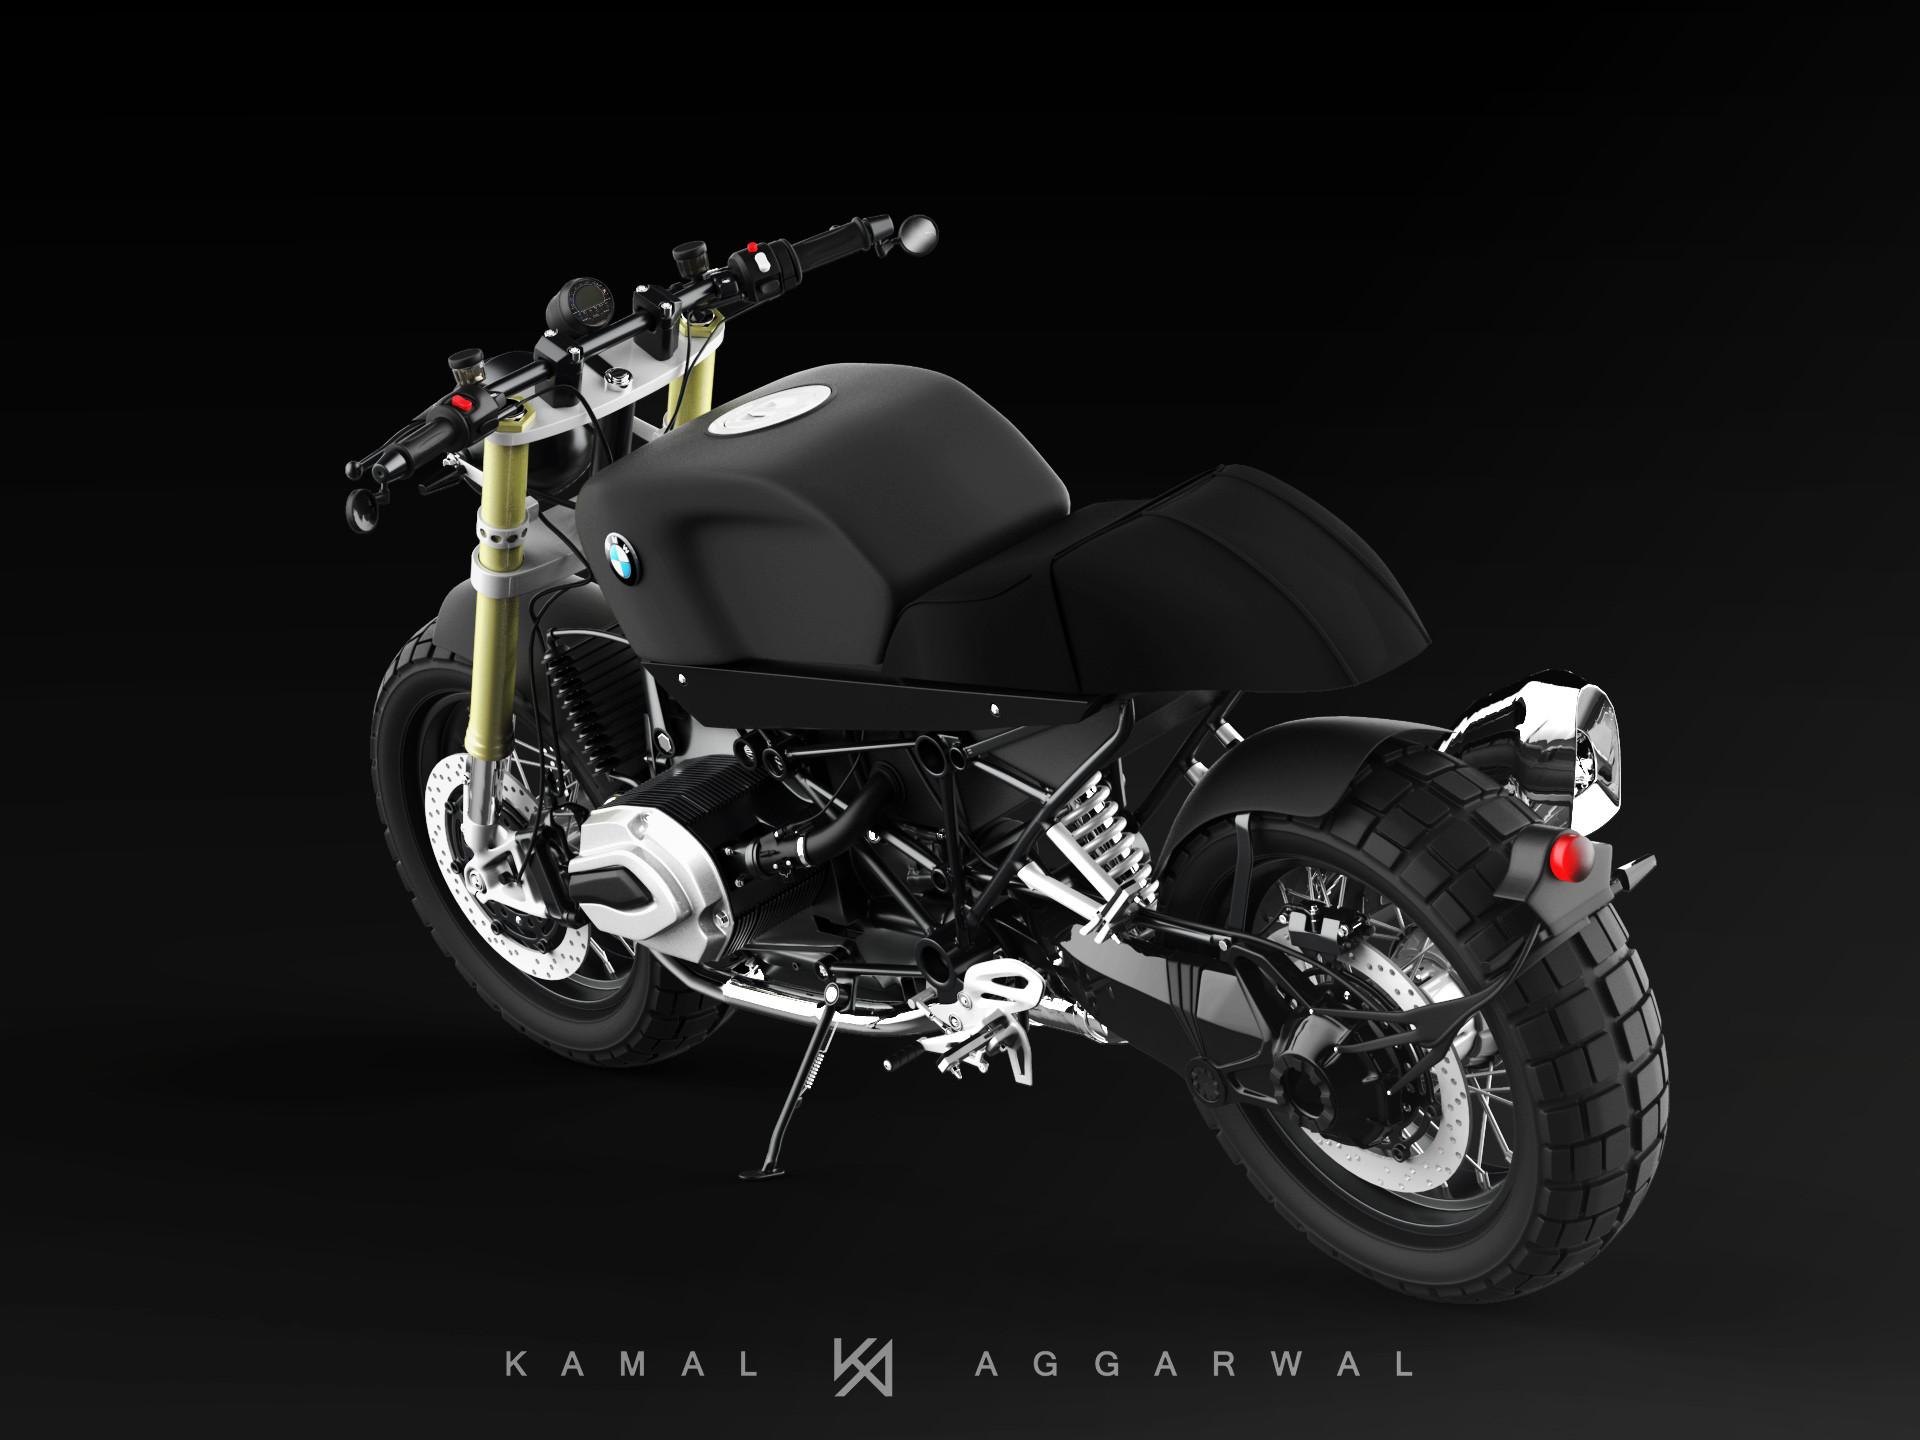 kamal aggarwal - BMW R1200R CUSTOM BIKE